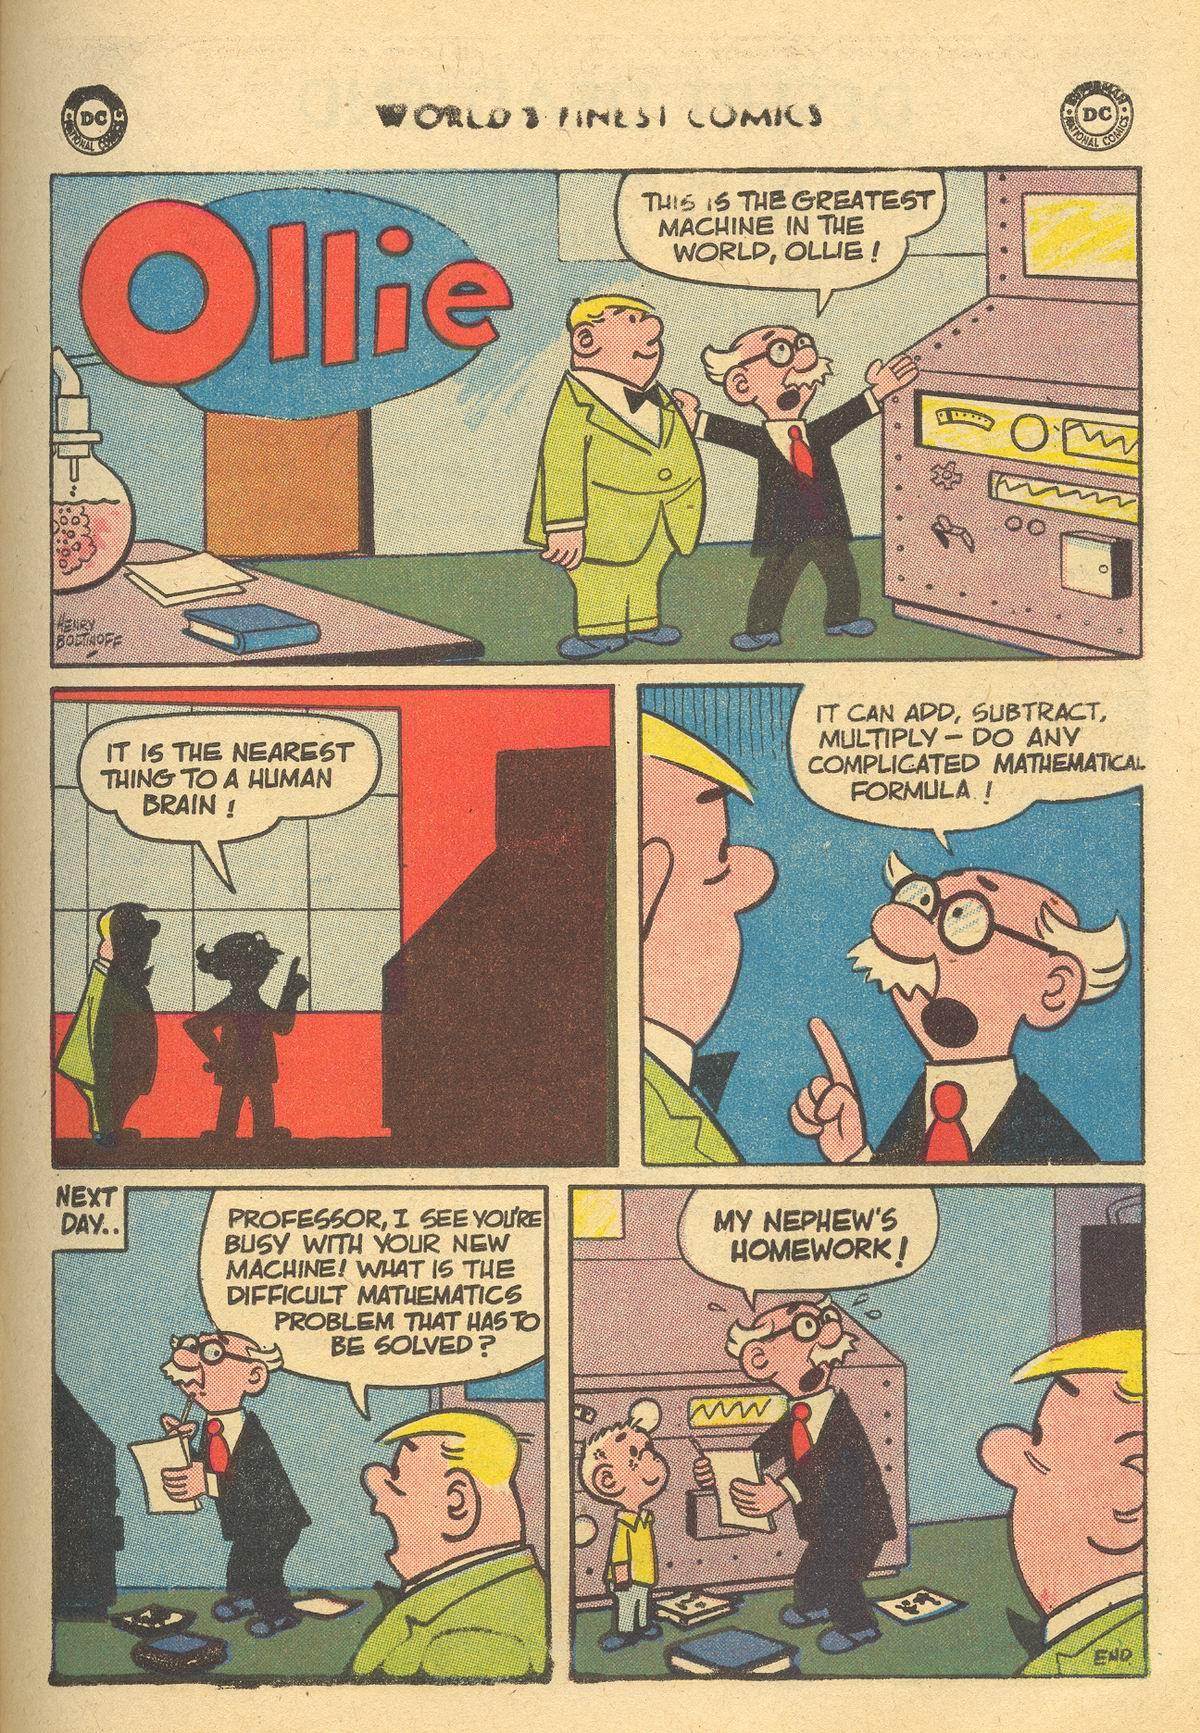 Read online World's Finest Comics comic -  Issue #105 - 25